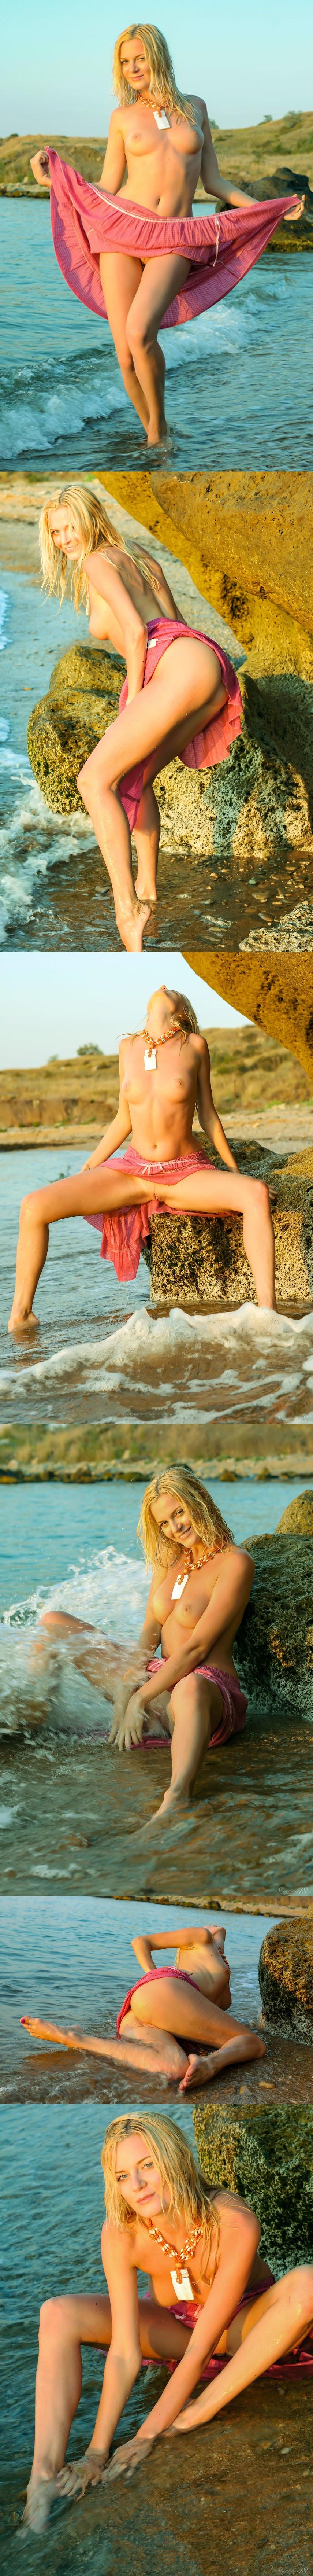 [Stunning18] Stesha - Pink Long Skirt - Girlsdelta